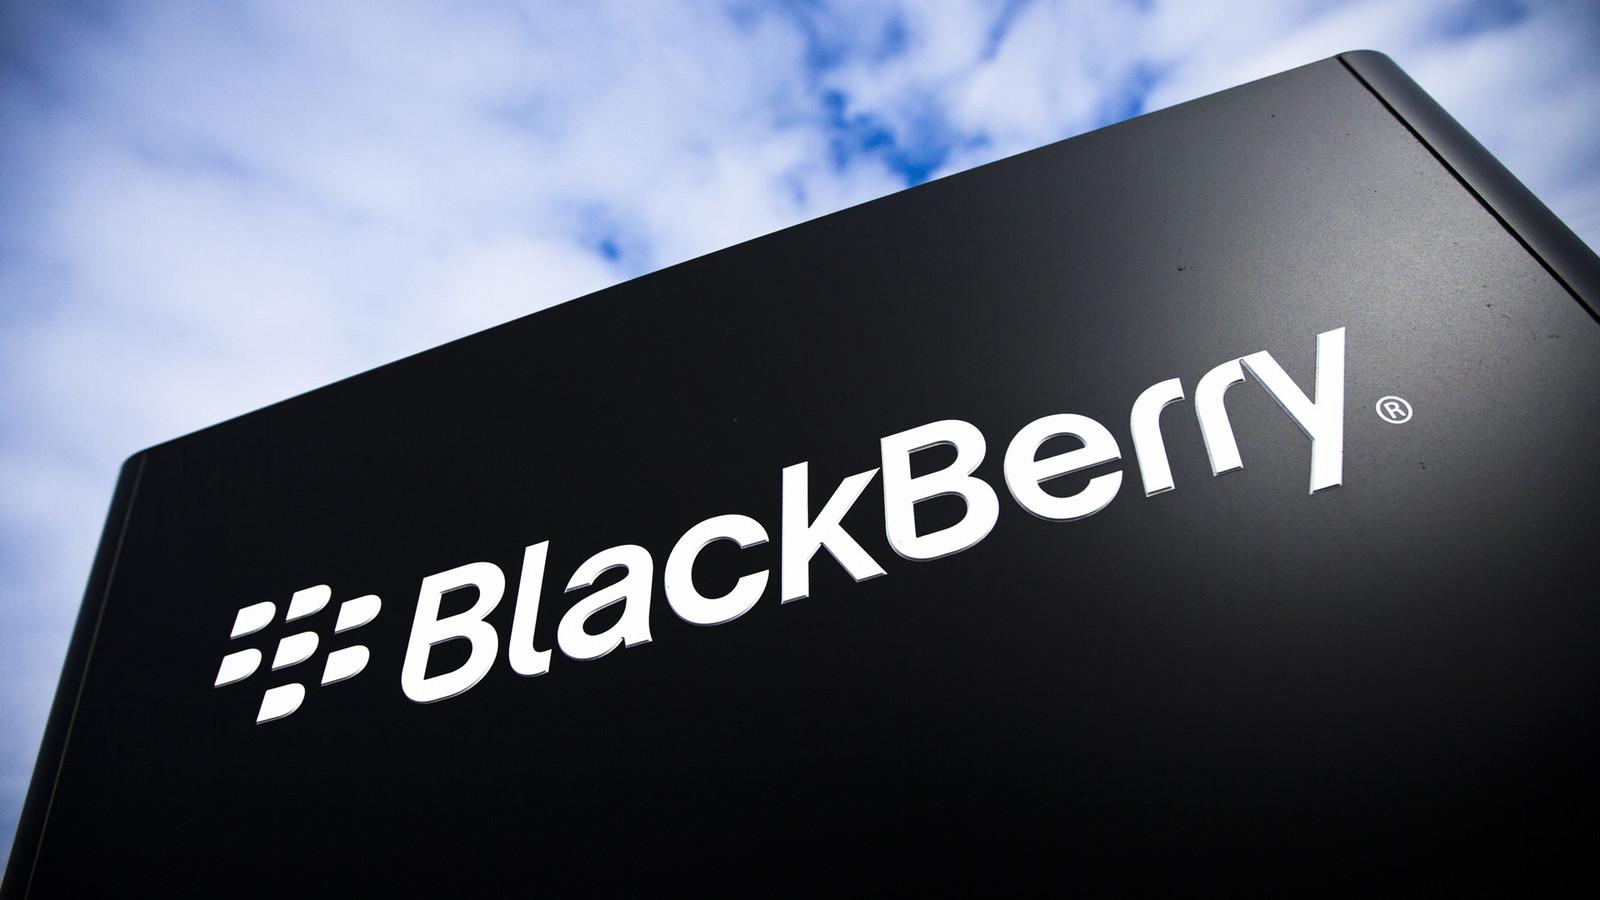 BlackBerry распространила свои патенты HEVC на платформу лицензирования Velos Media